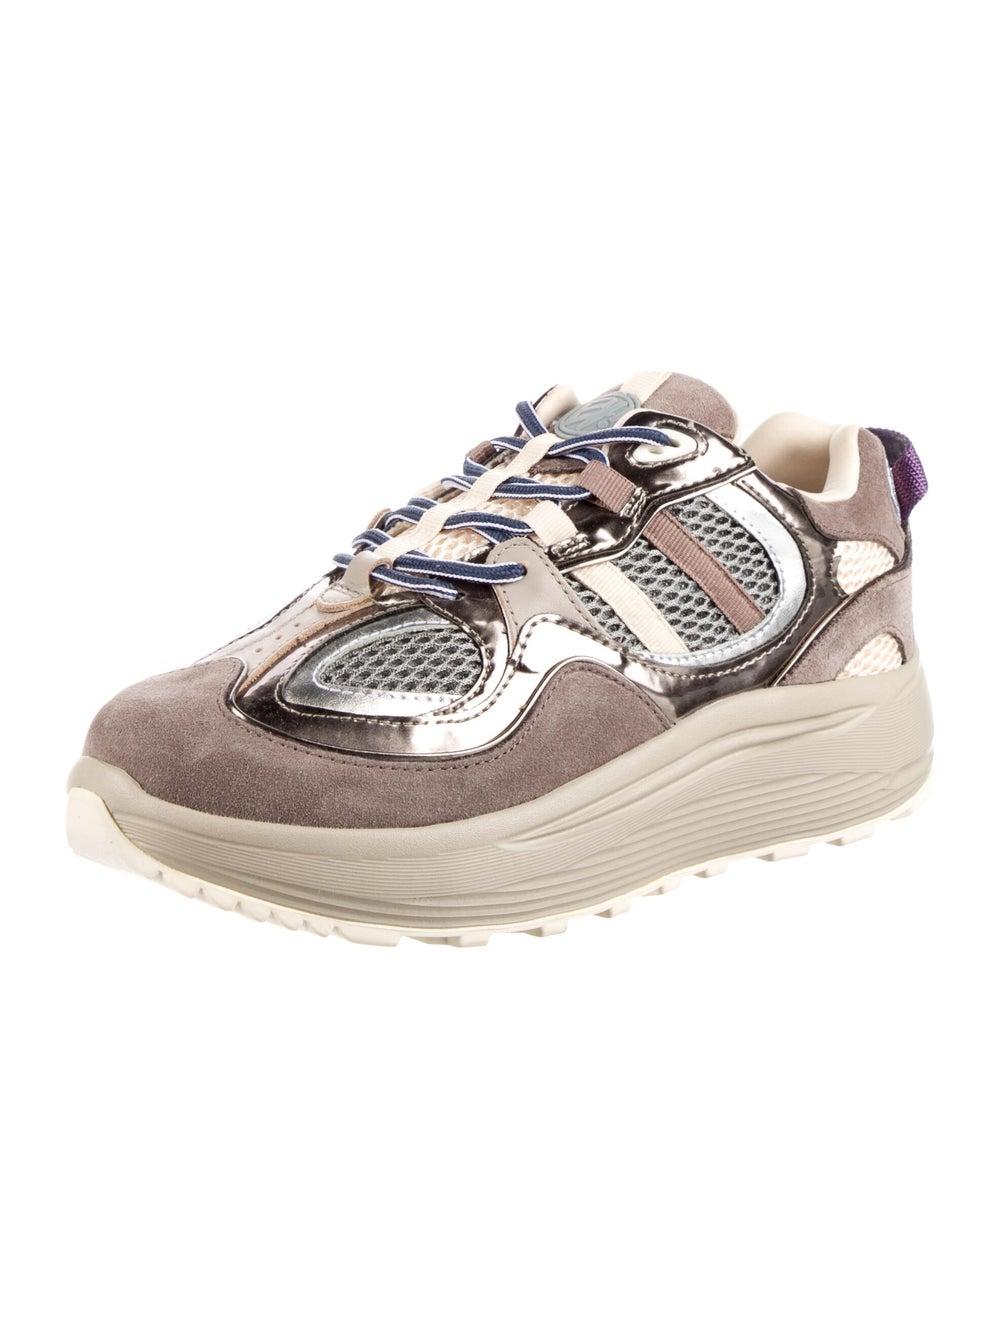 Eytys Jet Iron Sneakers - image 2